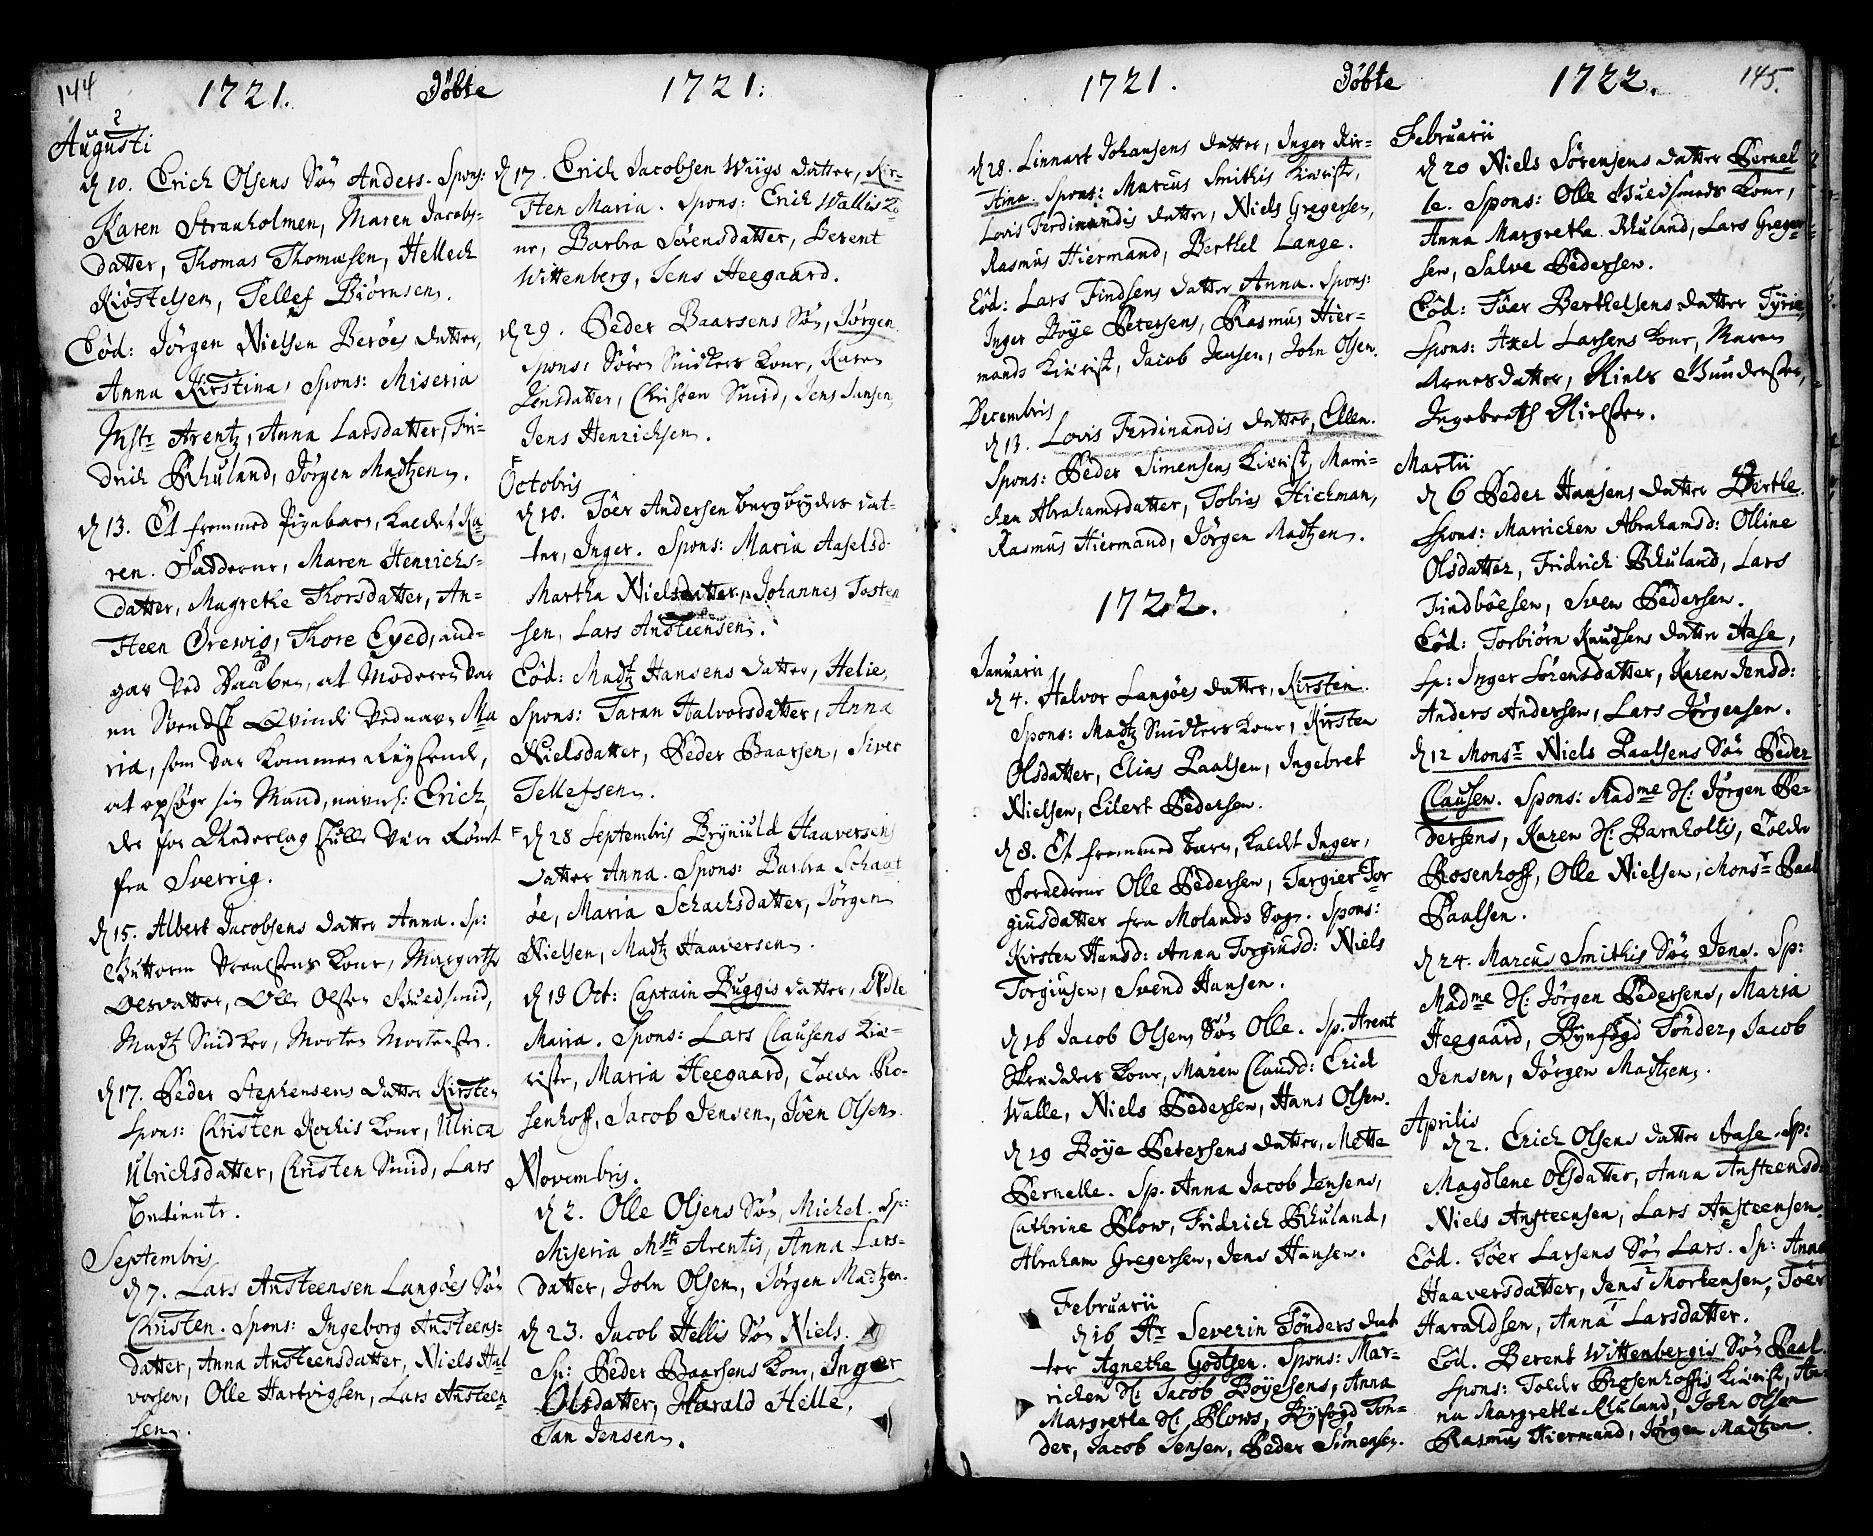 SAKO, Kragerø kirkebøker, F/Fa/L0001: Ministerialbok nr. 1, 1702-1766, s. 144-145